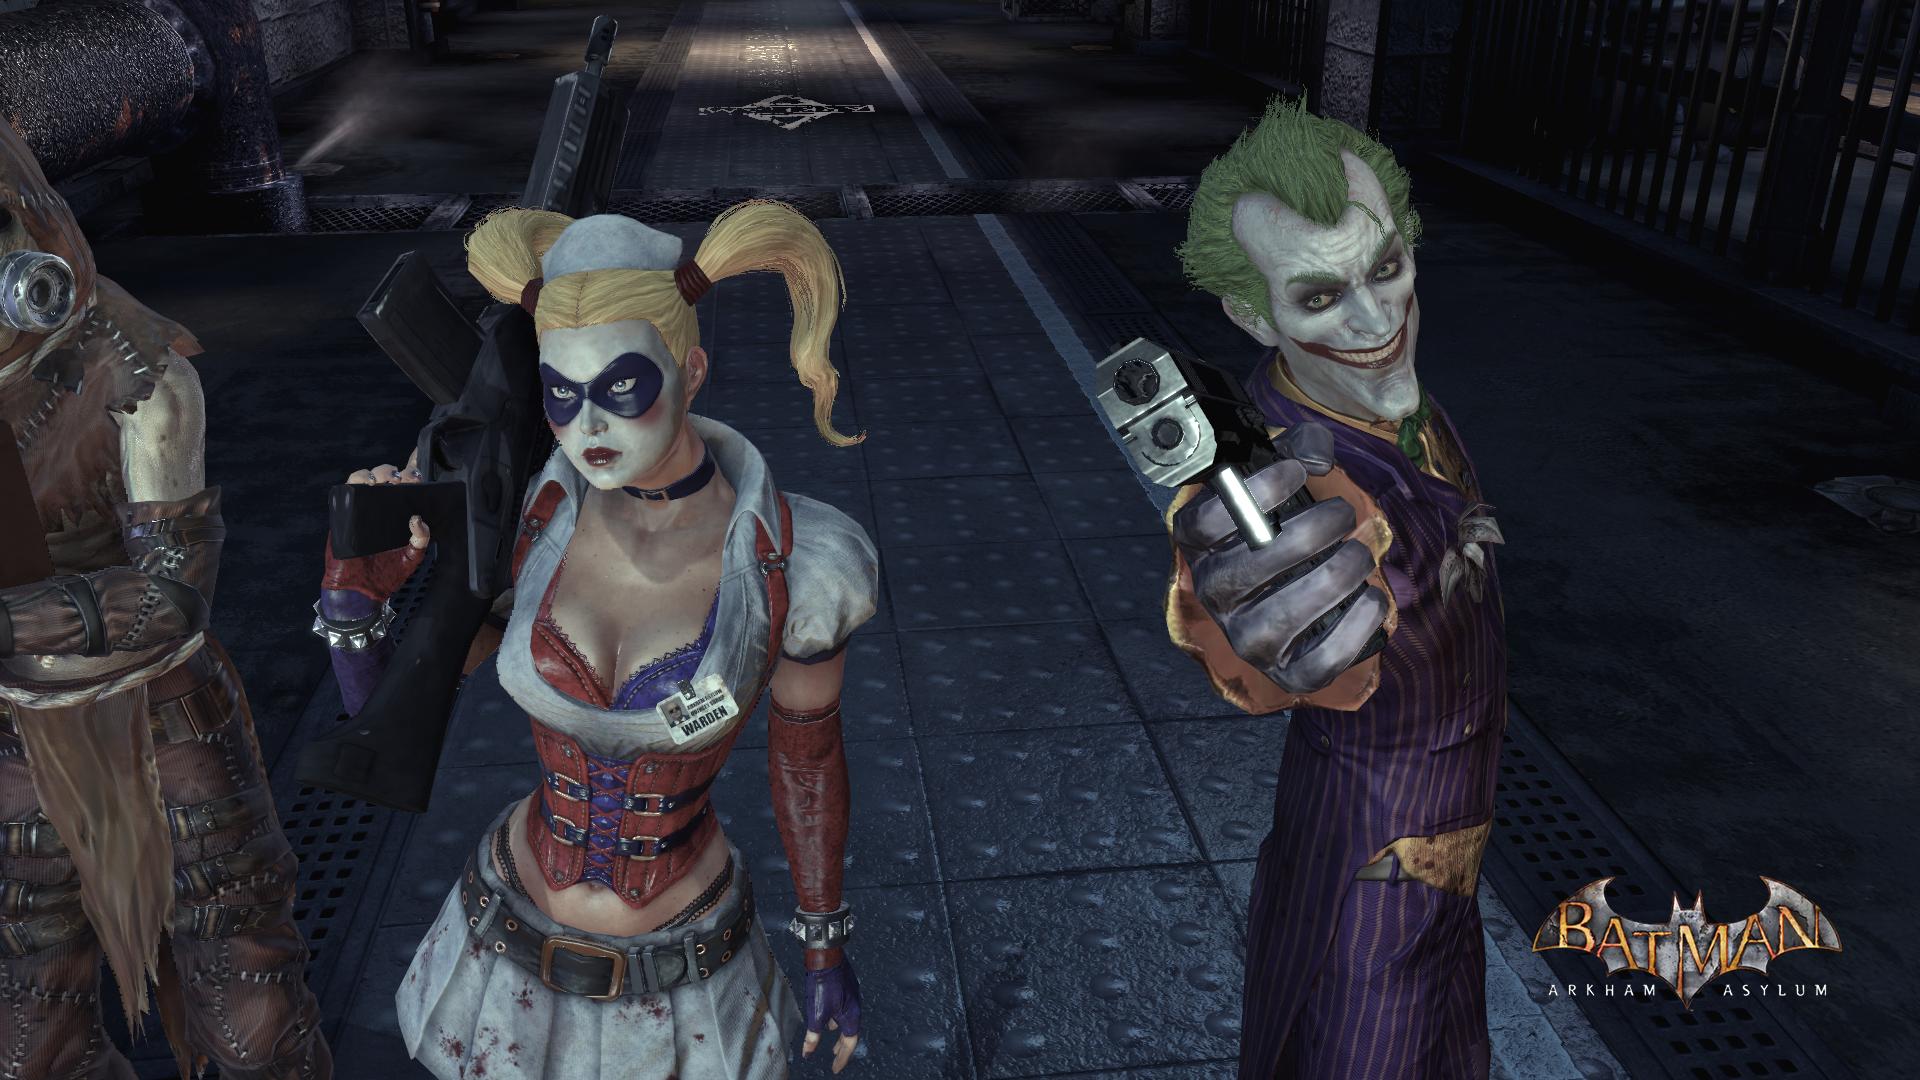 Harley Quinn Batman Arkham Asylum Photo 9158363 Fanpop 1920x1080